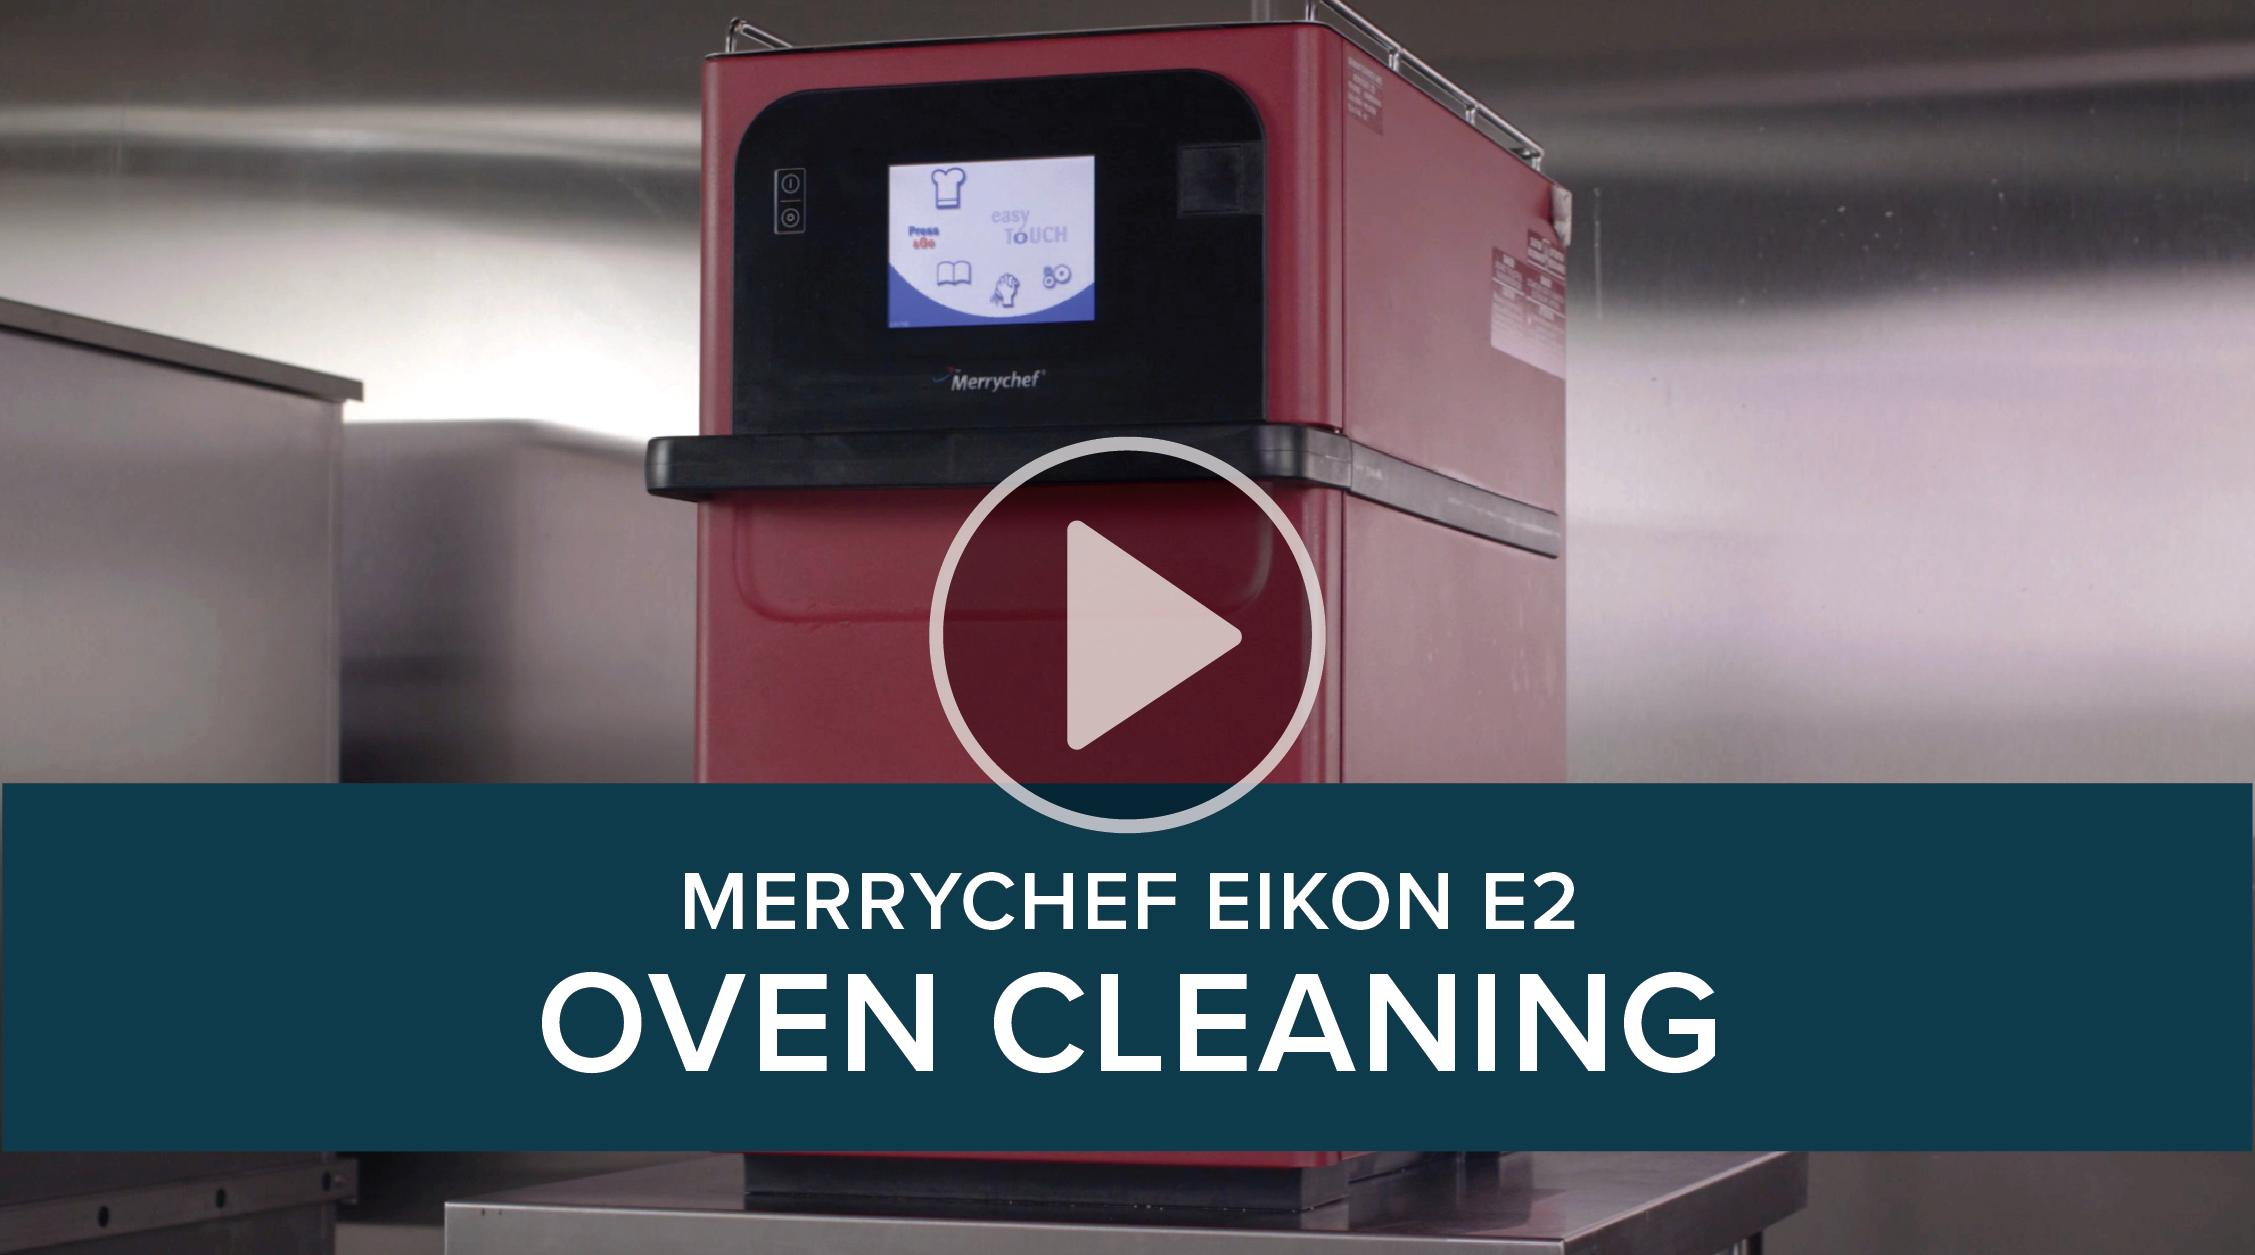 Merrychef Eikon E2 Cleaning Process